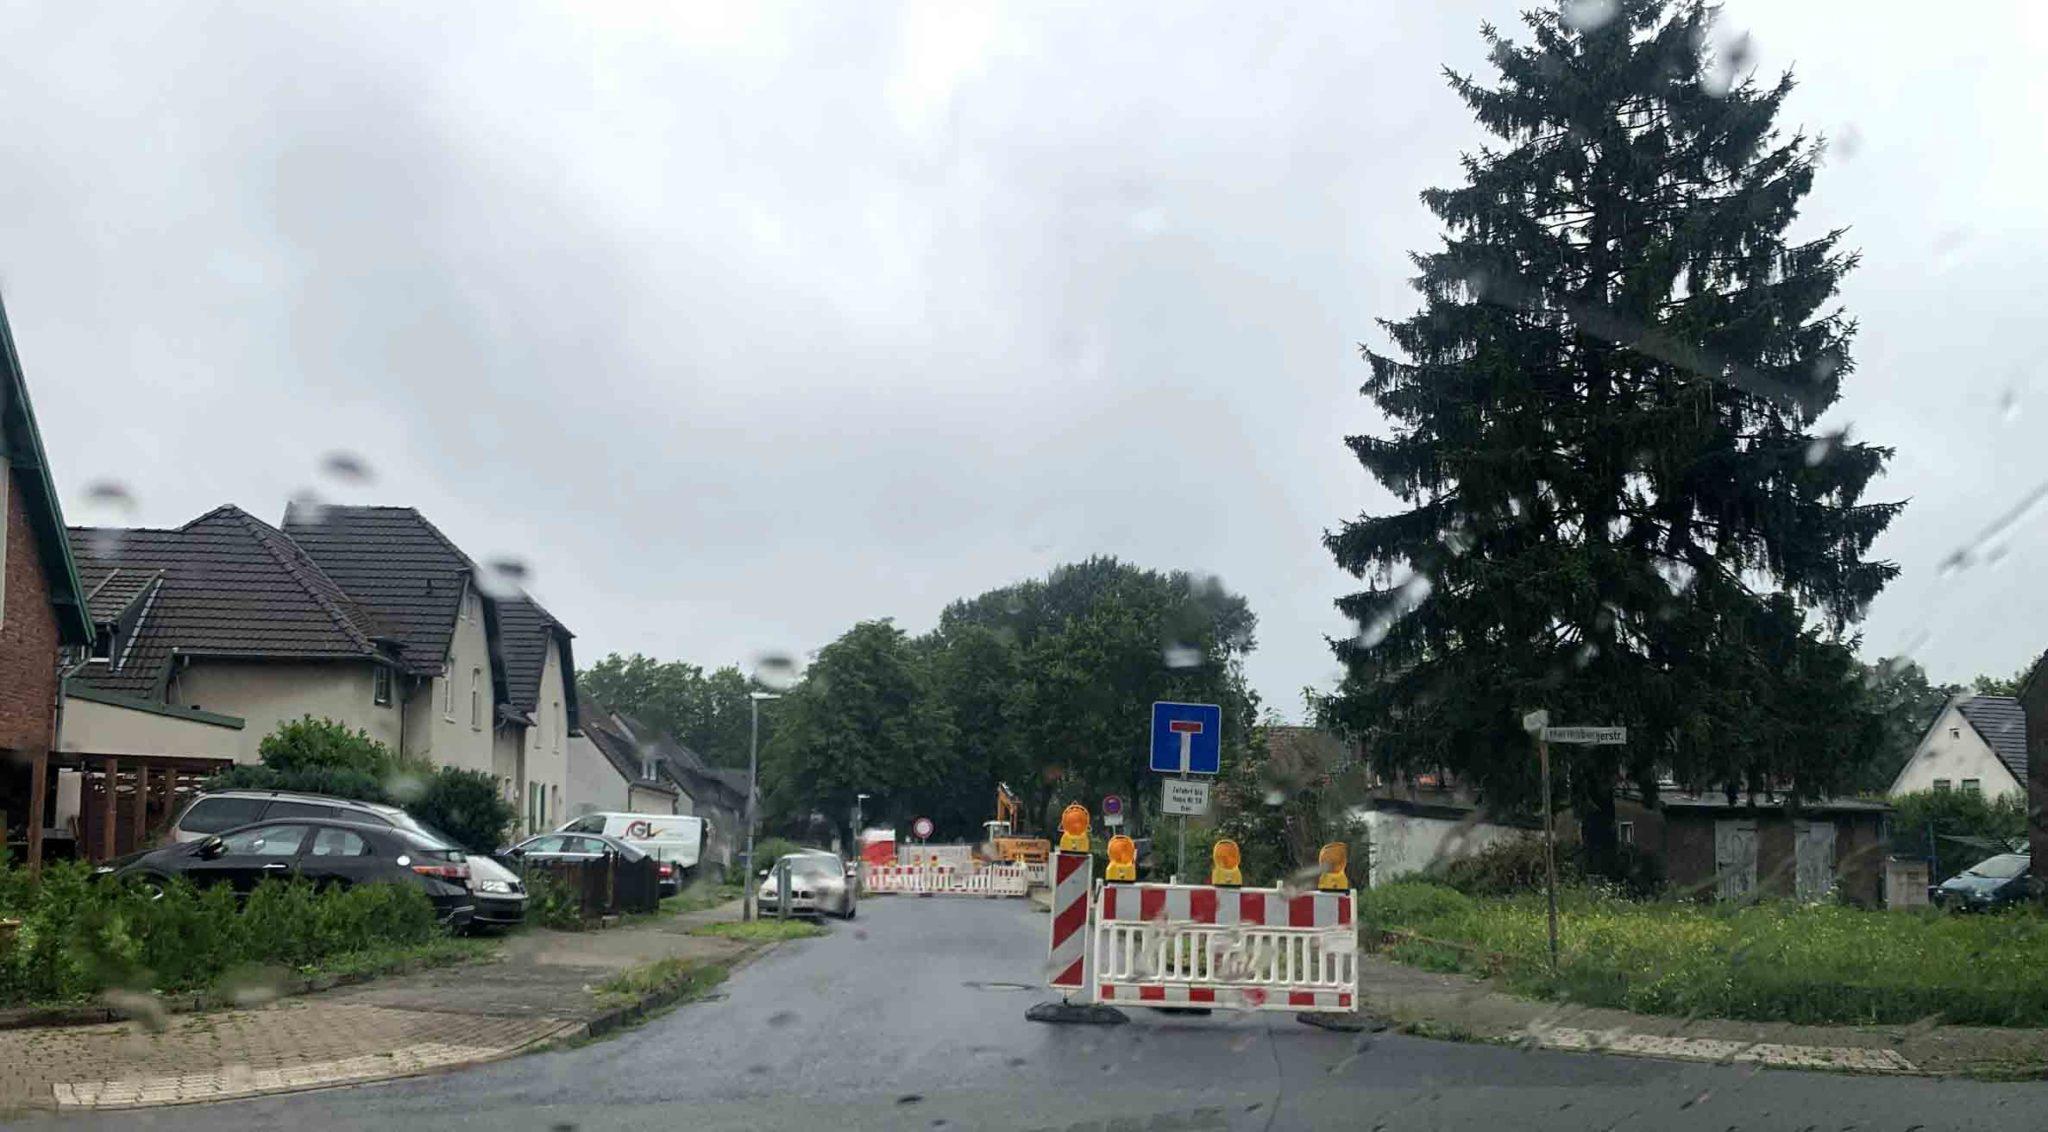 Enni erneuert Schmutzwasserkanal in Moers-Meerbeck